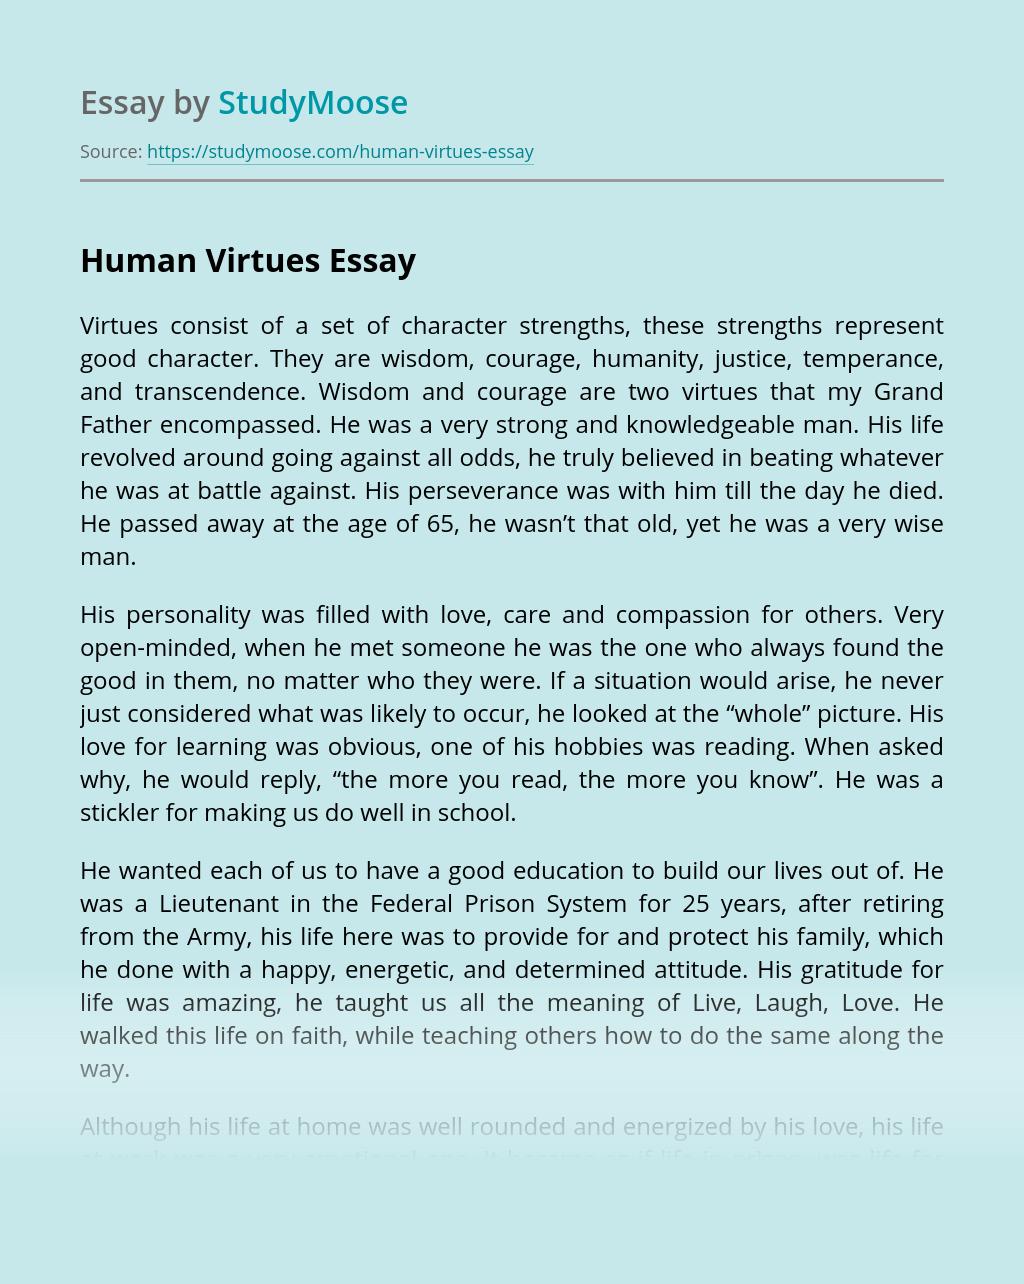 Human Virtues